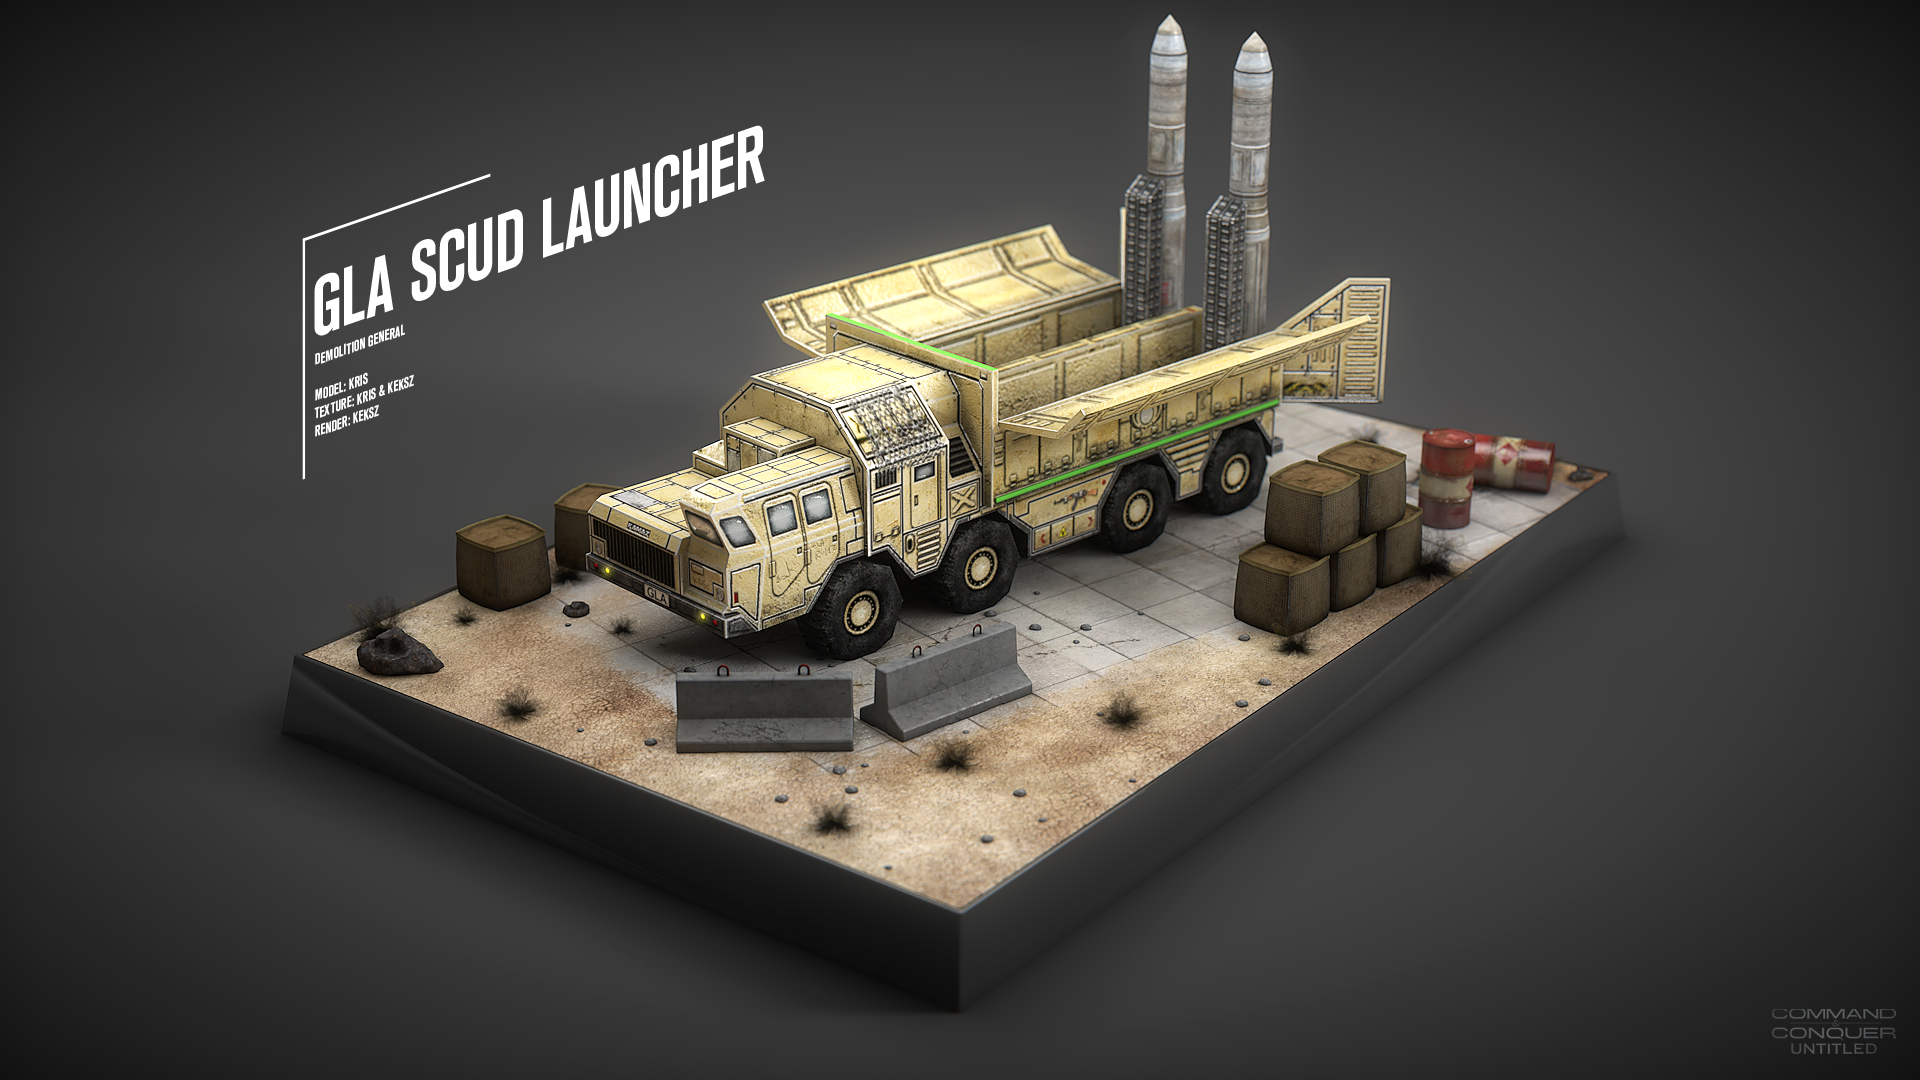 GLA Scud Launcher (Demo General) image - C&C: Untitled mod